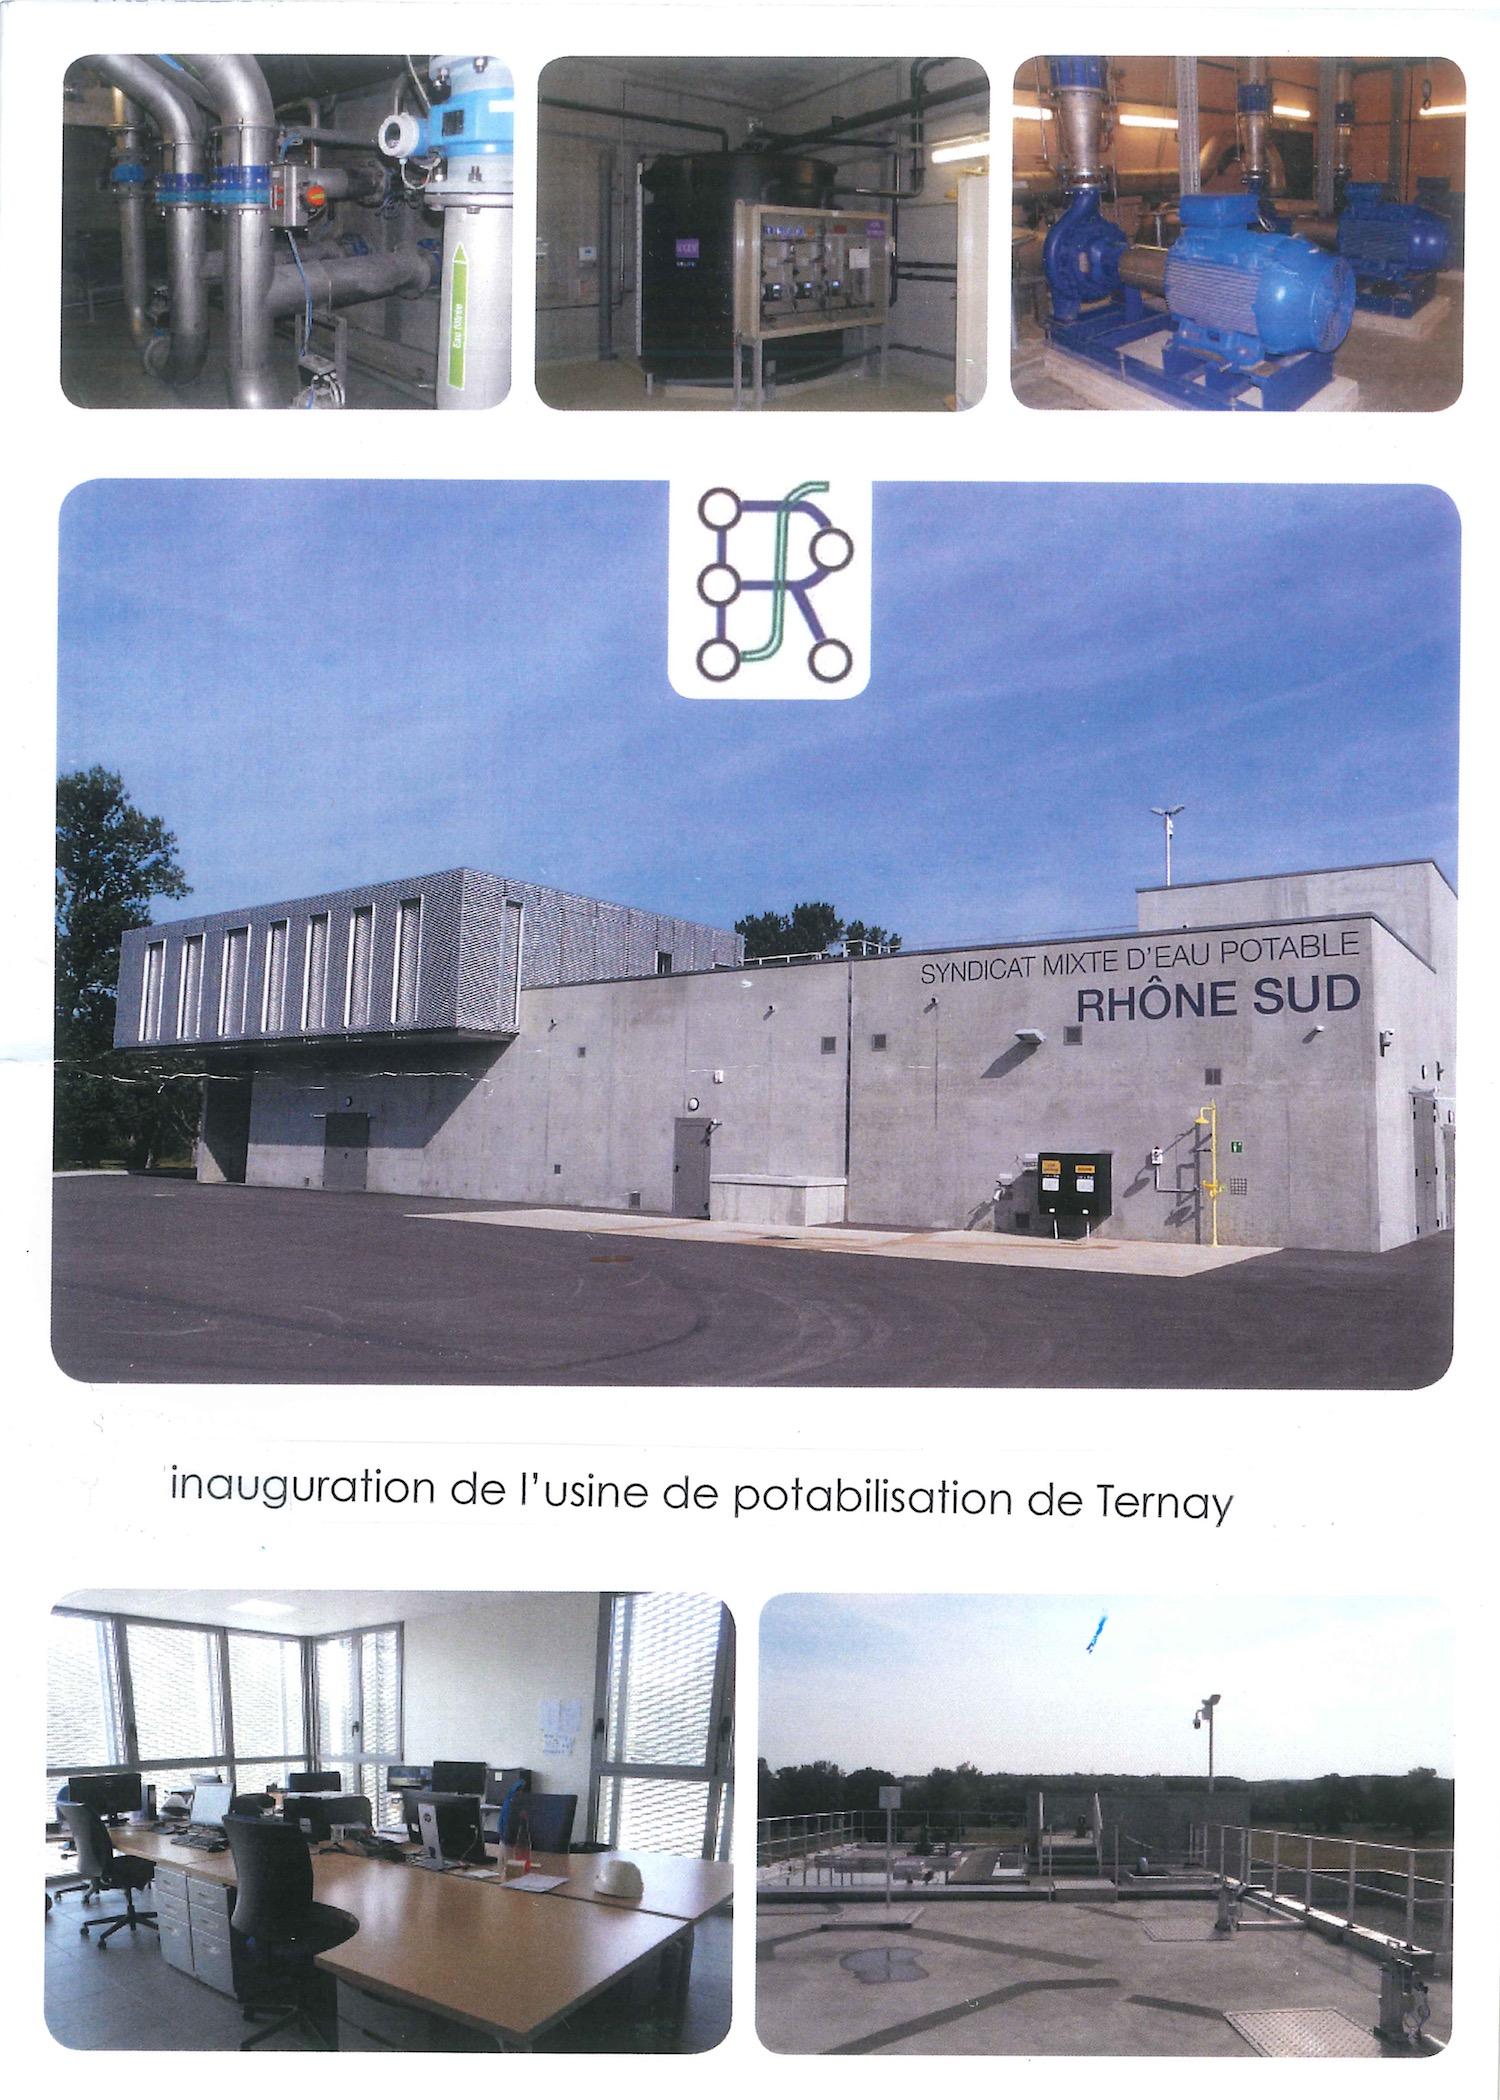 Inauguration de l'usine de potabilisation de Ternay